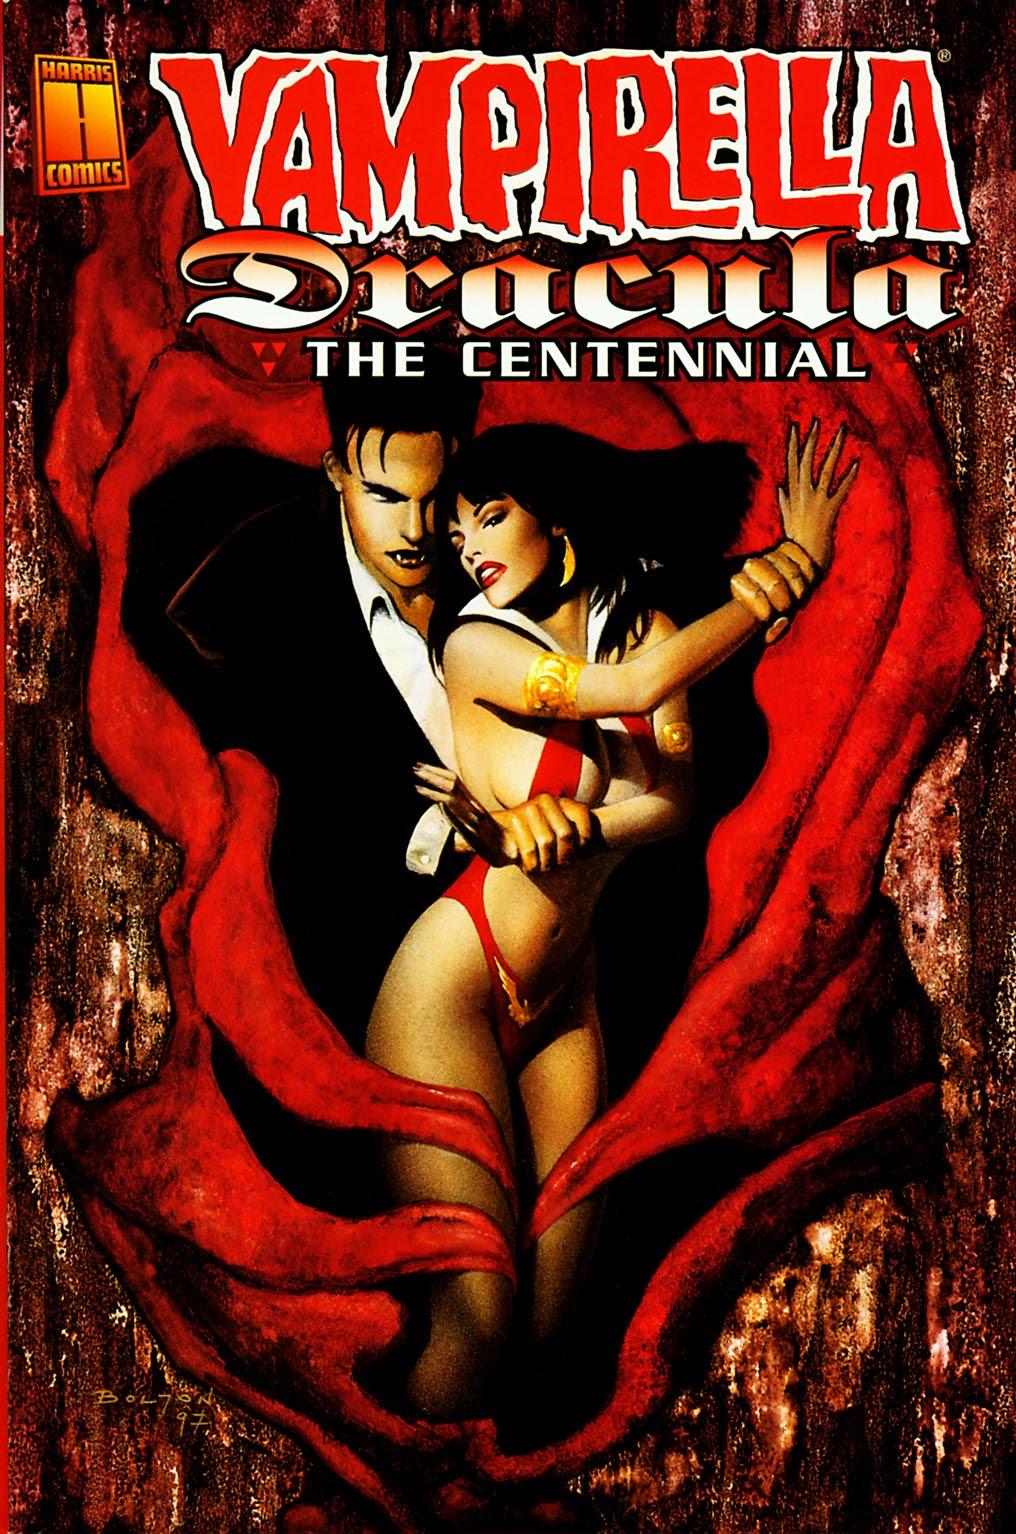 Vampirella / Dracula: The Centennial Full Page 1